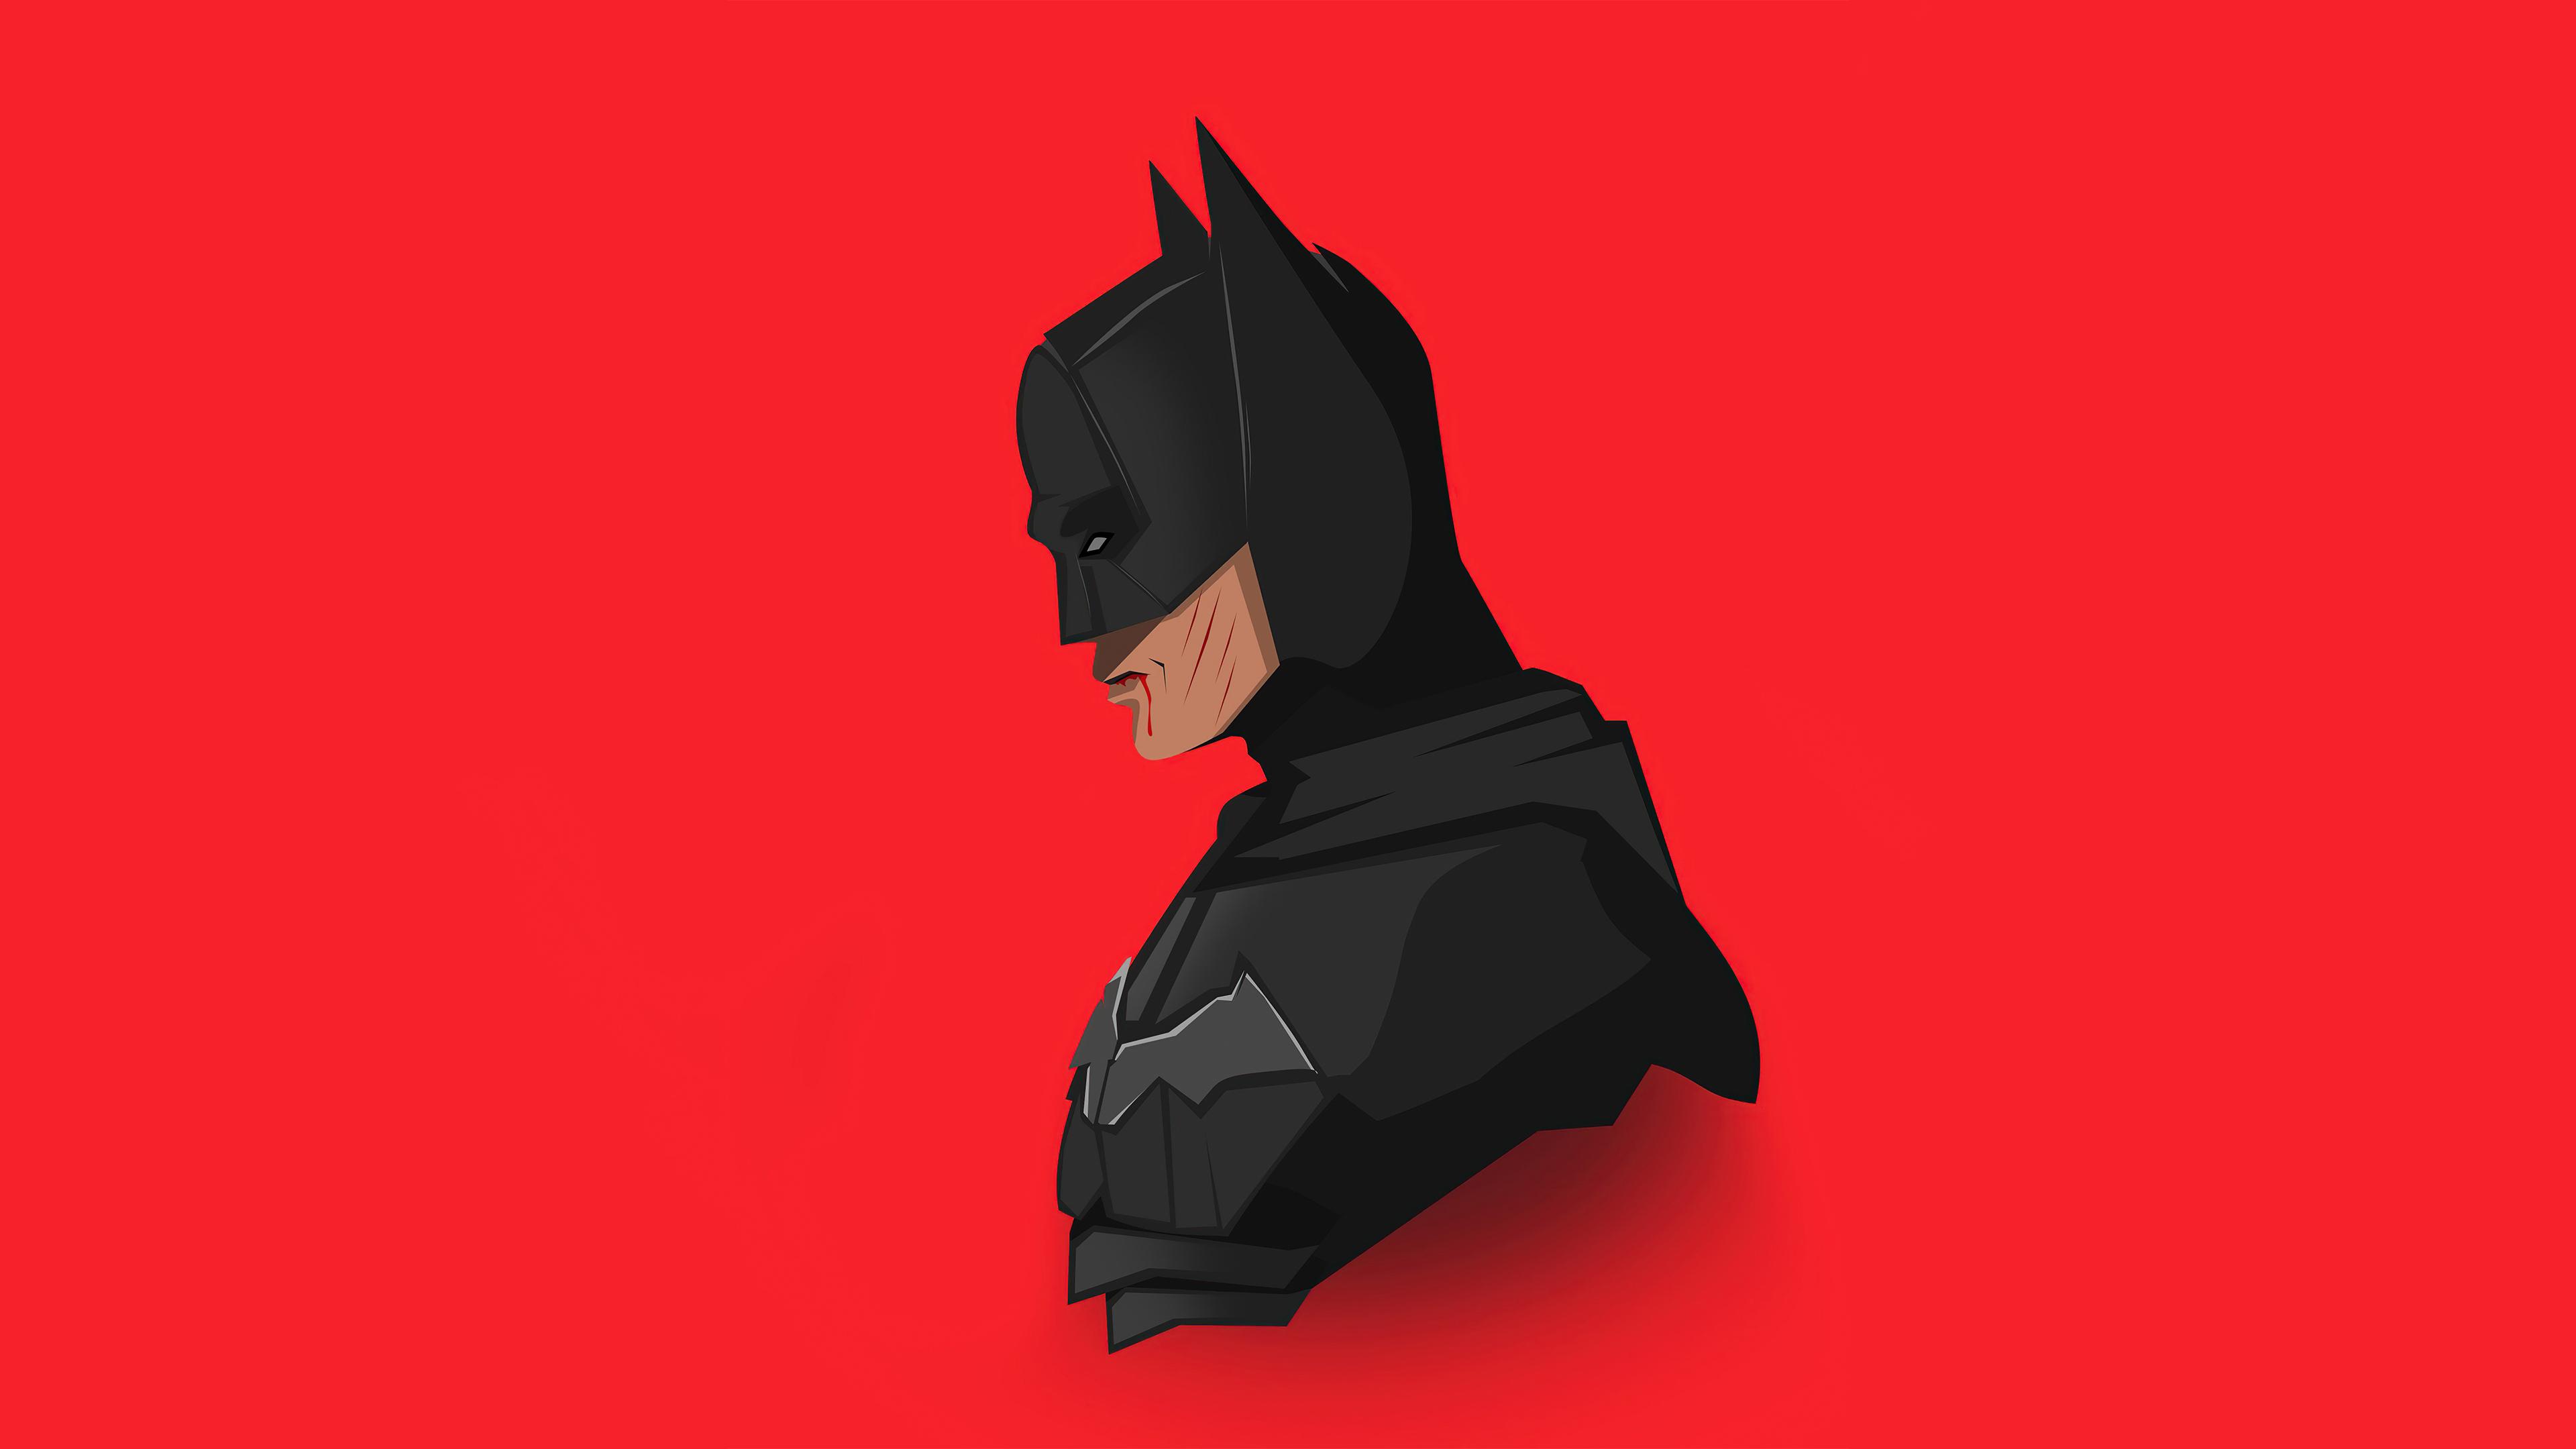 the batman 2021 4k 1604347917 - The Batman 2021 4k - The Batman 2021 4k wallpapers